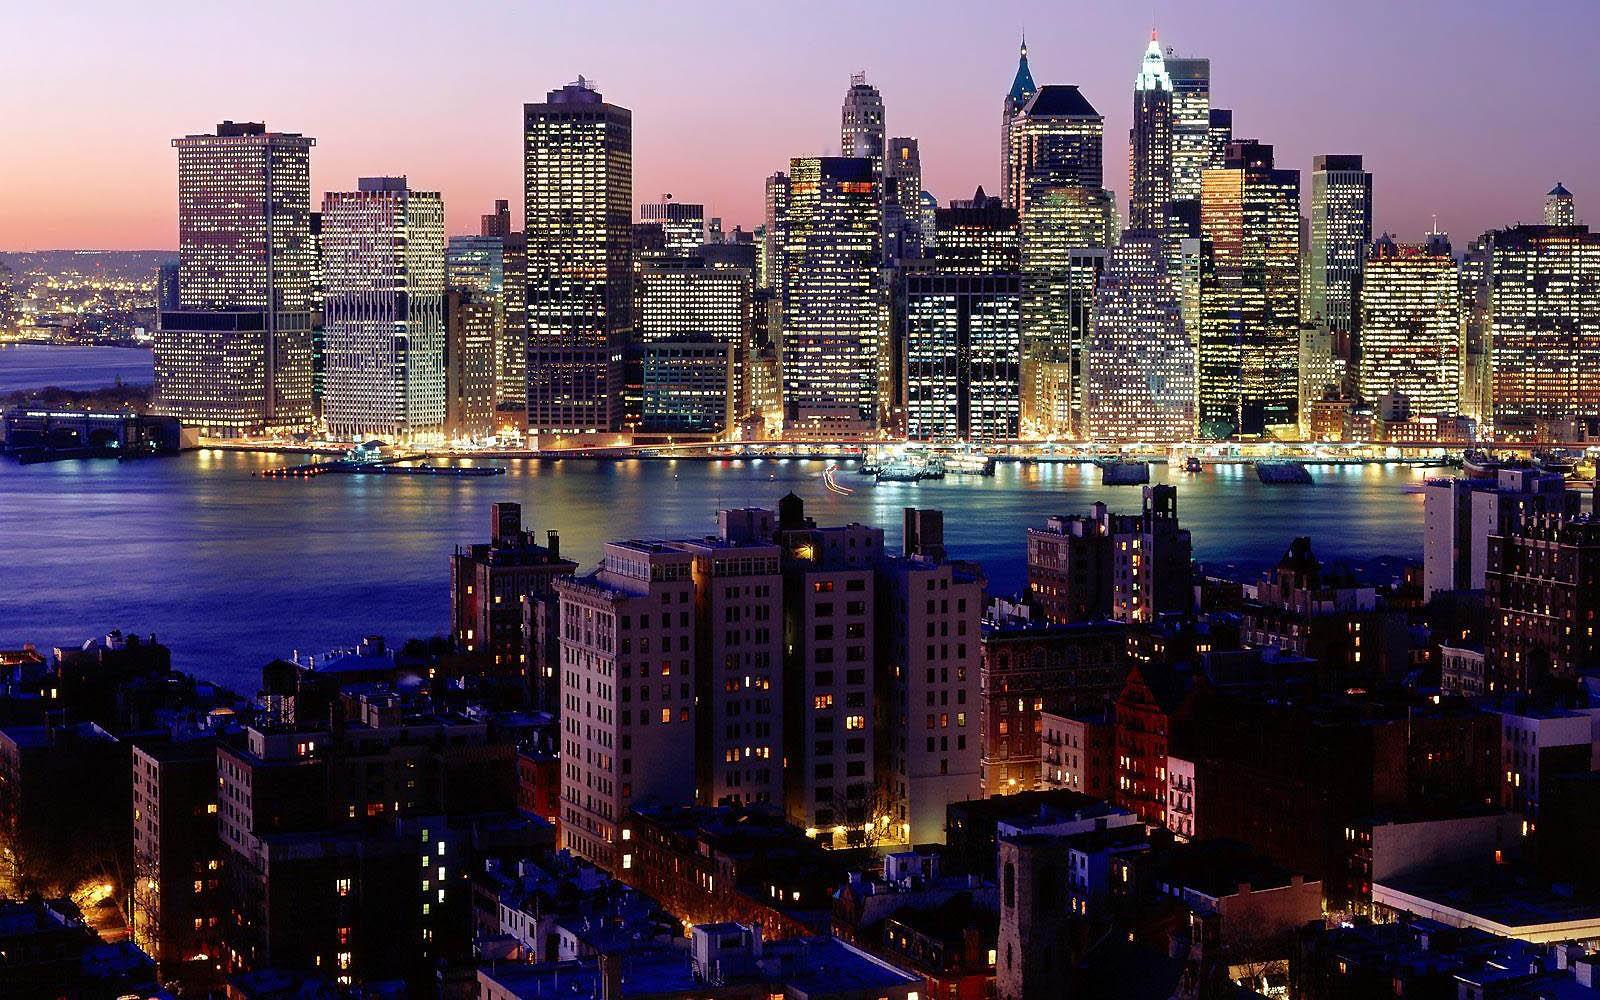 HD wallpaper Twilight Sky New York City New York Desktop Background 1600x1000